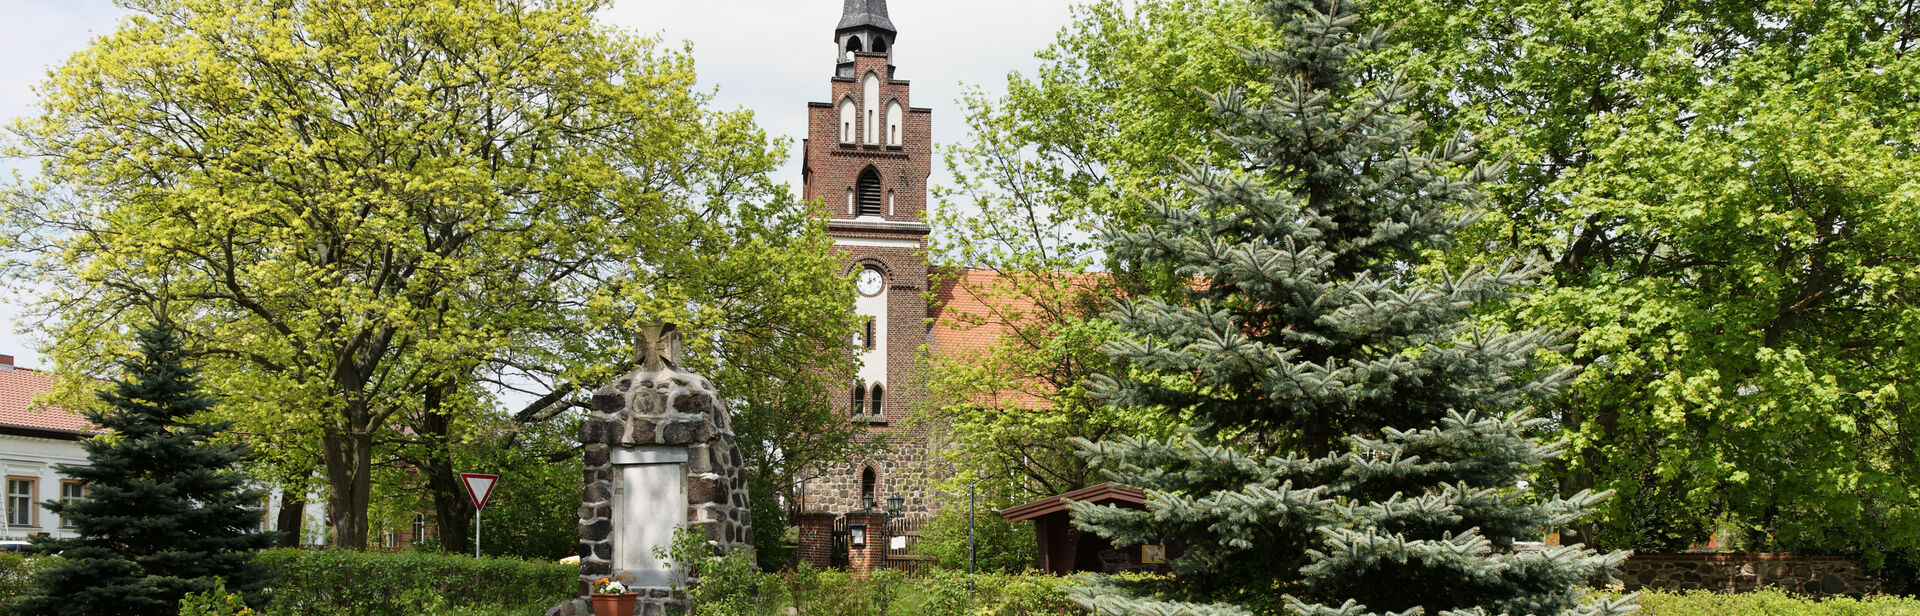 Kirche Münchehofe